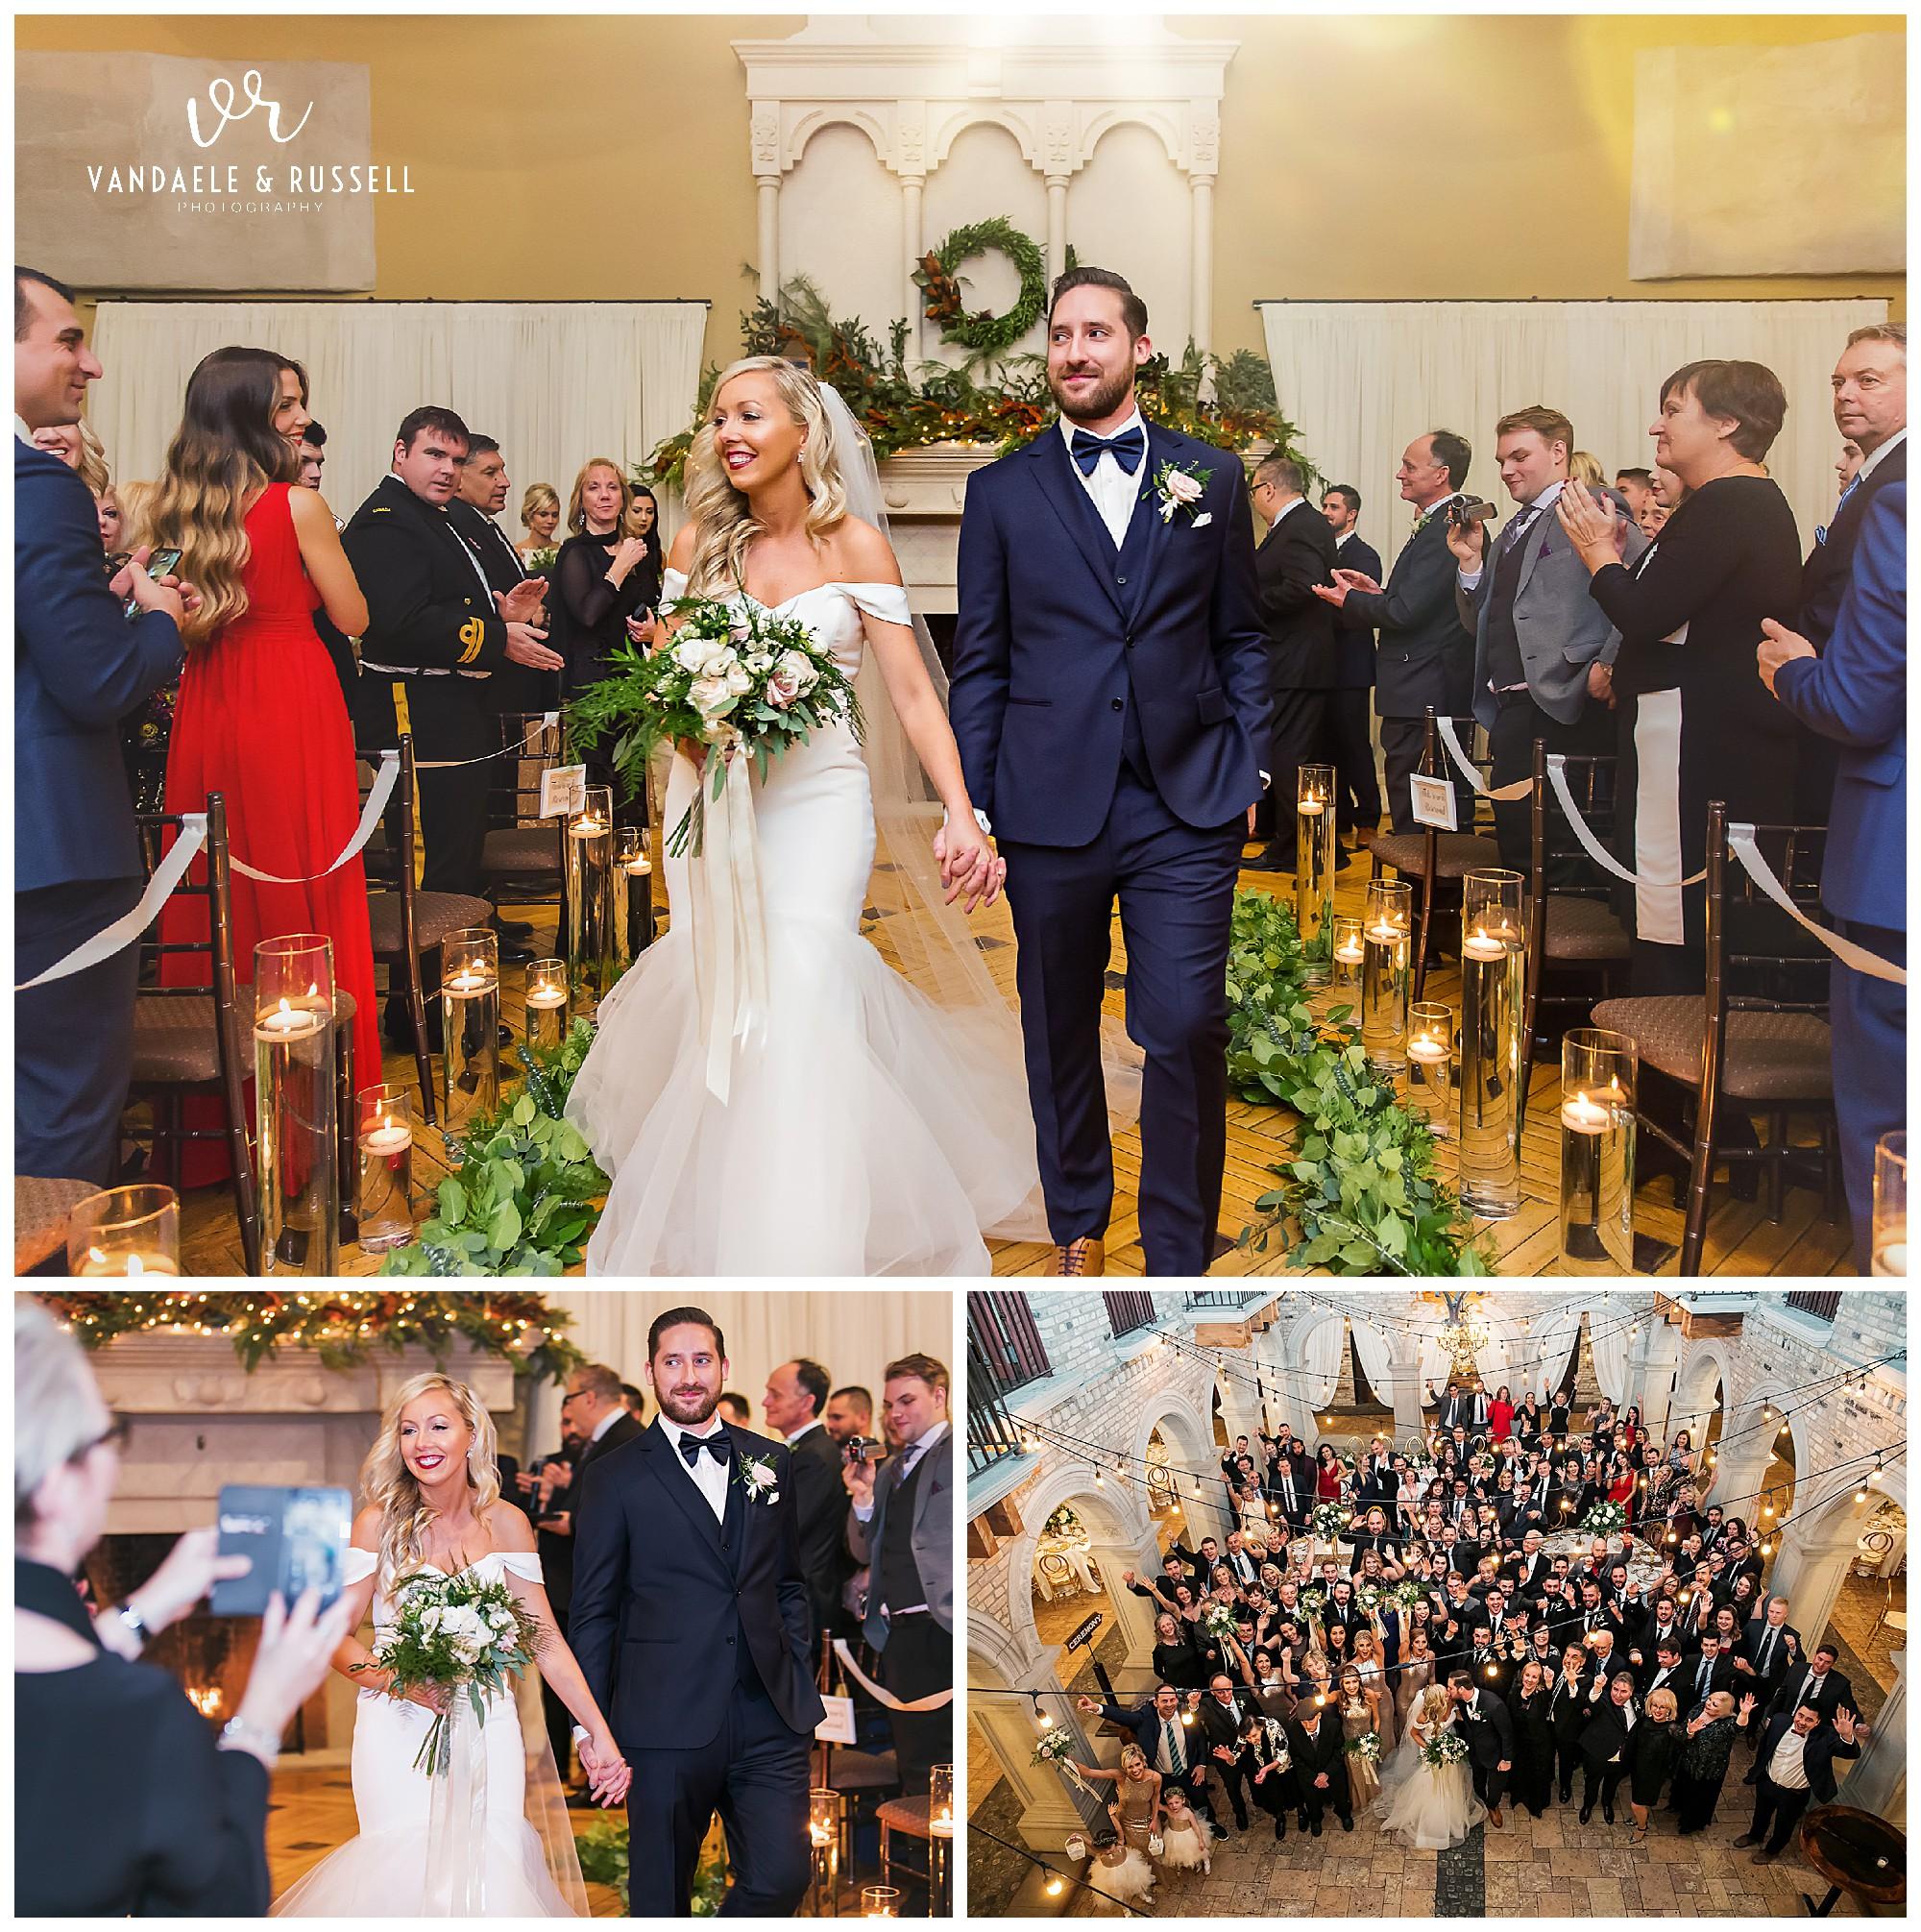 Hacienda-Sarria-Wedding-Photos-NYE-Michelle-Matt-VanDaele-Russell_0036.jpg